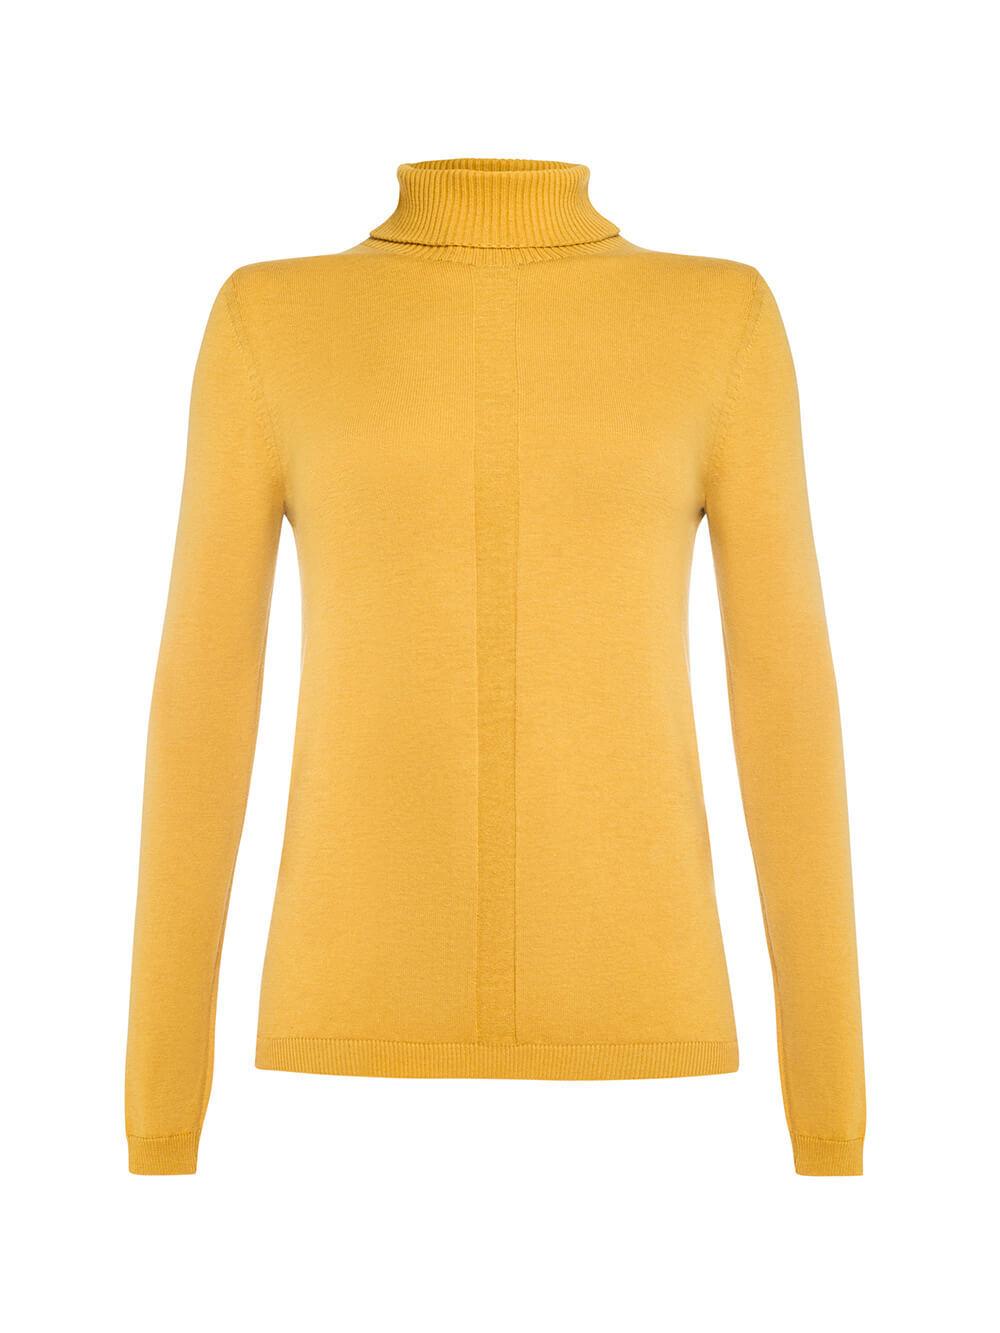 Женский джемпер желтого цвета из шерсти и шелка - фото 1